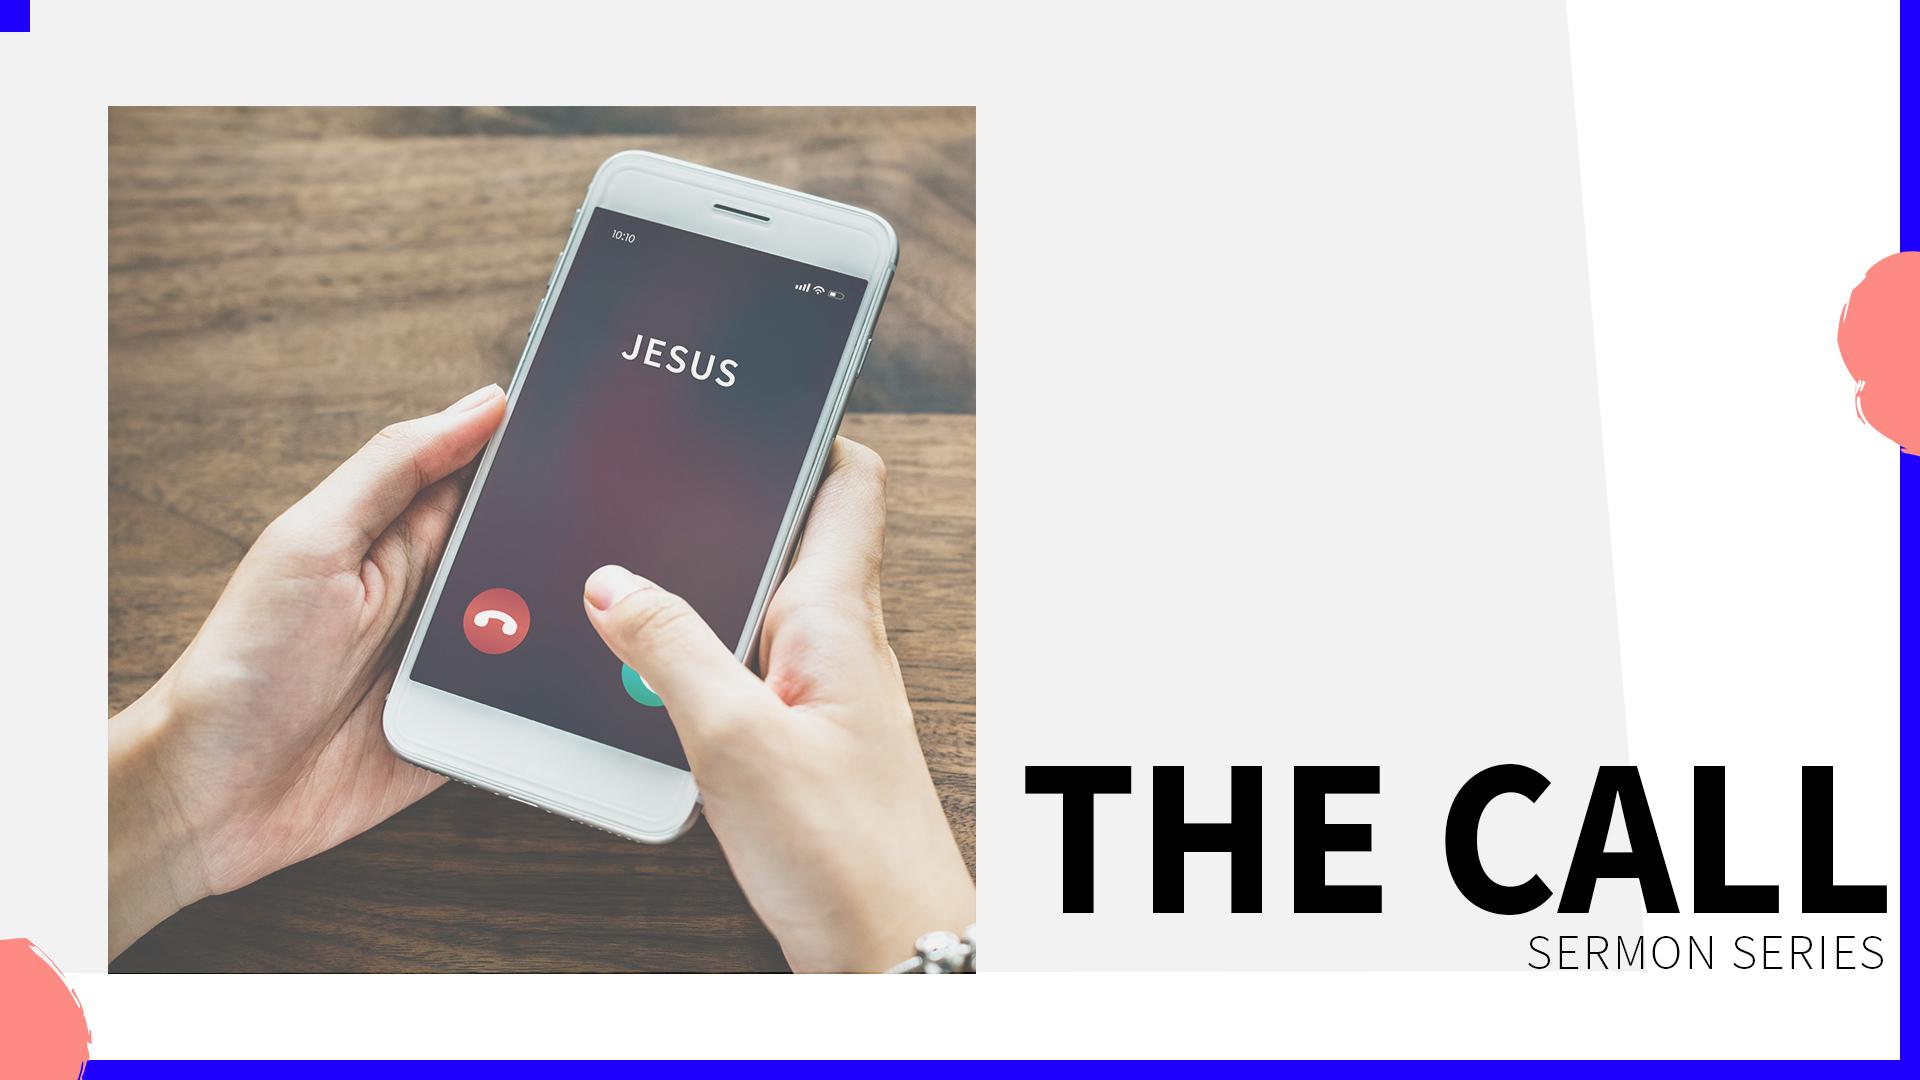 The-Calling-Sermon-Series-4.jpg